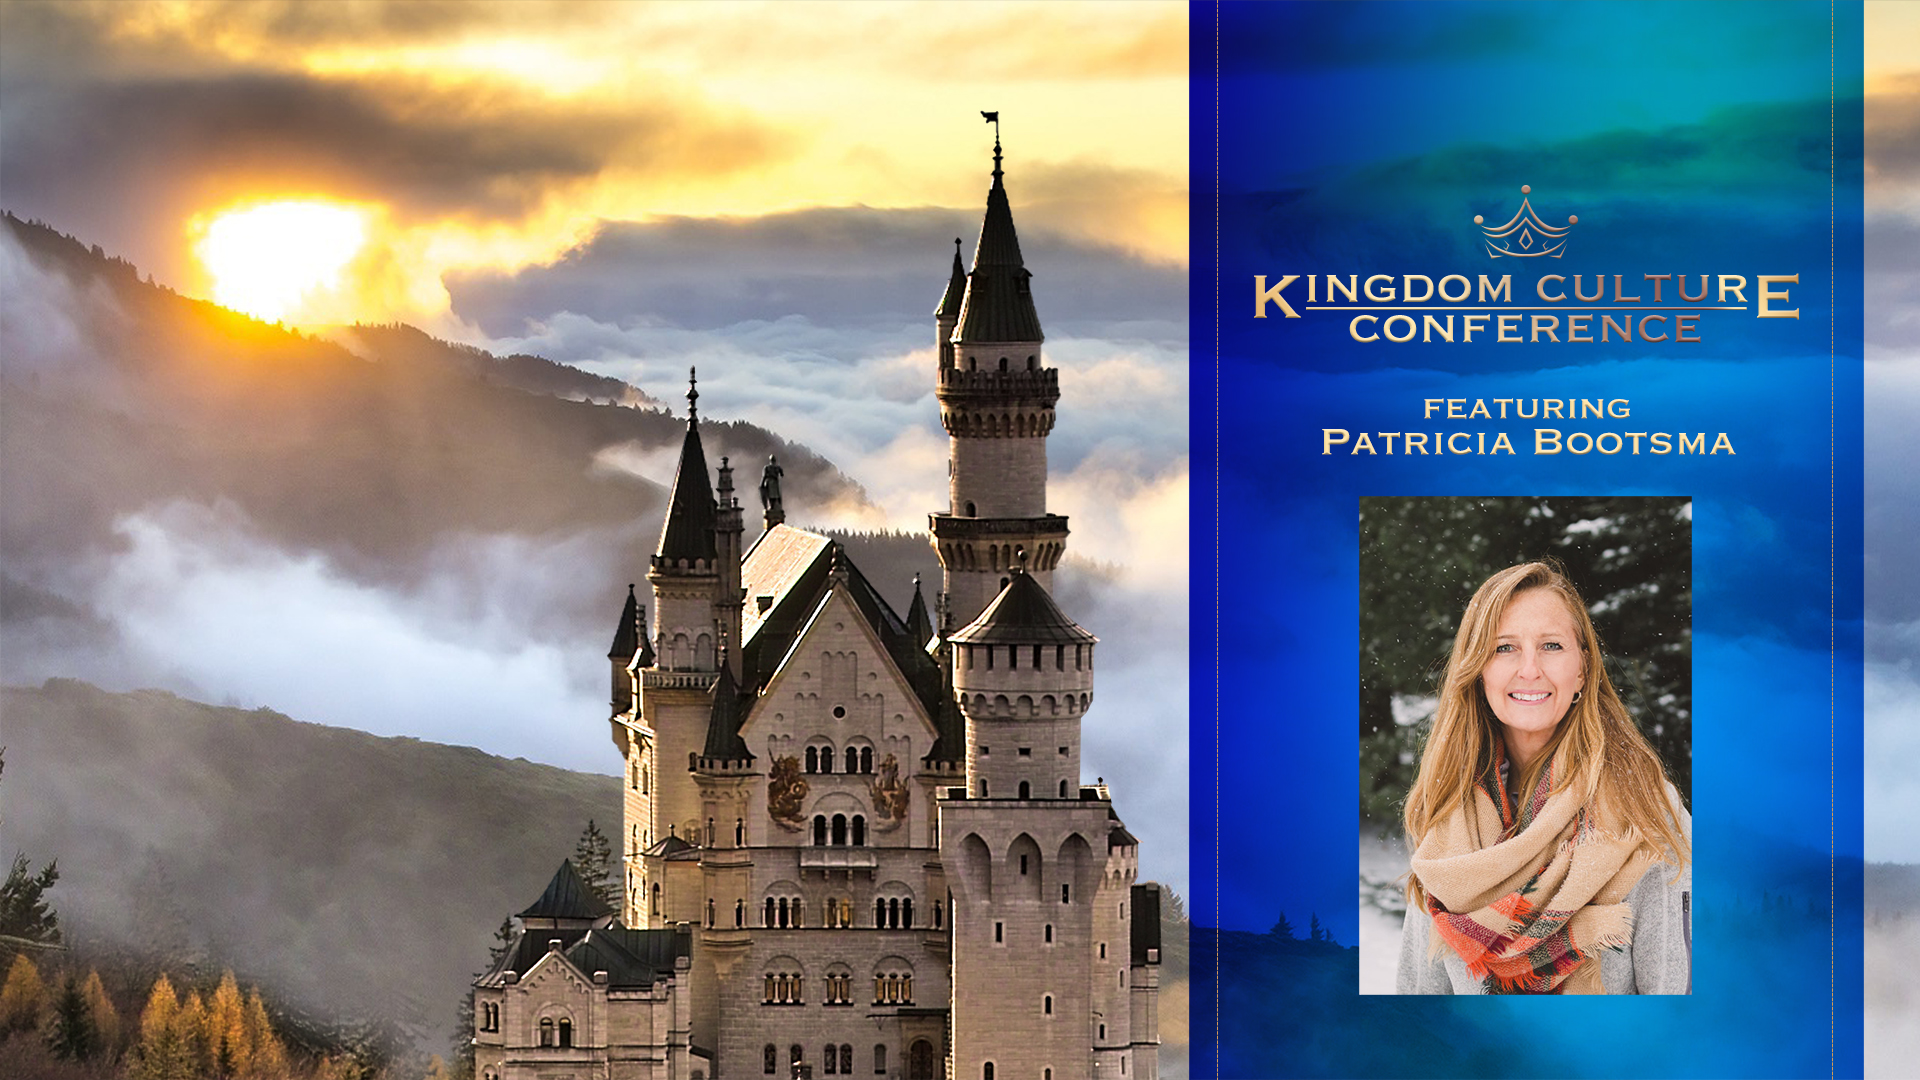 Kingdom Culture Conference